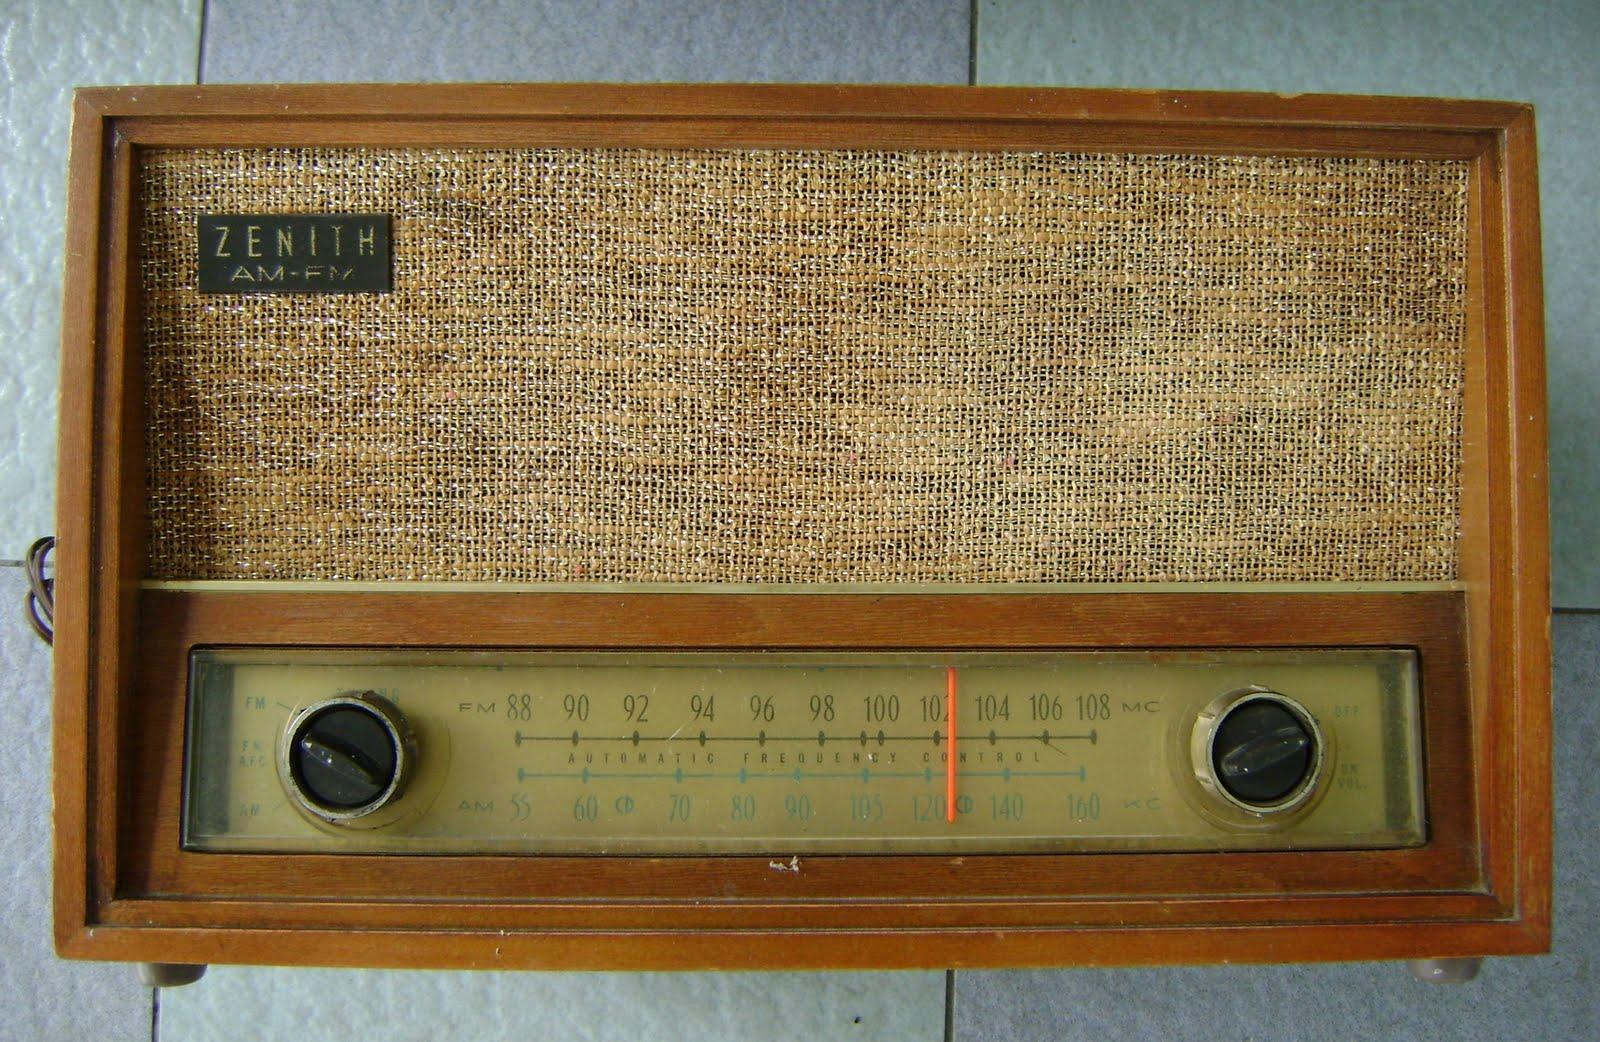 KINTA VALLEY AUDIO: Zenith Model C730 tube radio ( Used ) Sold